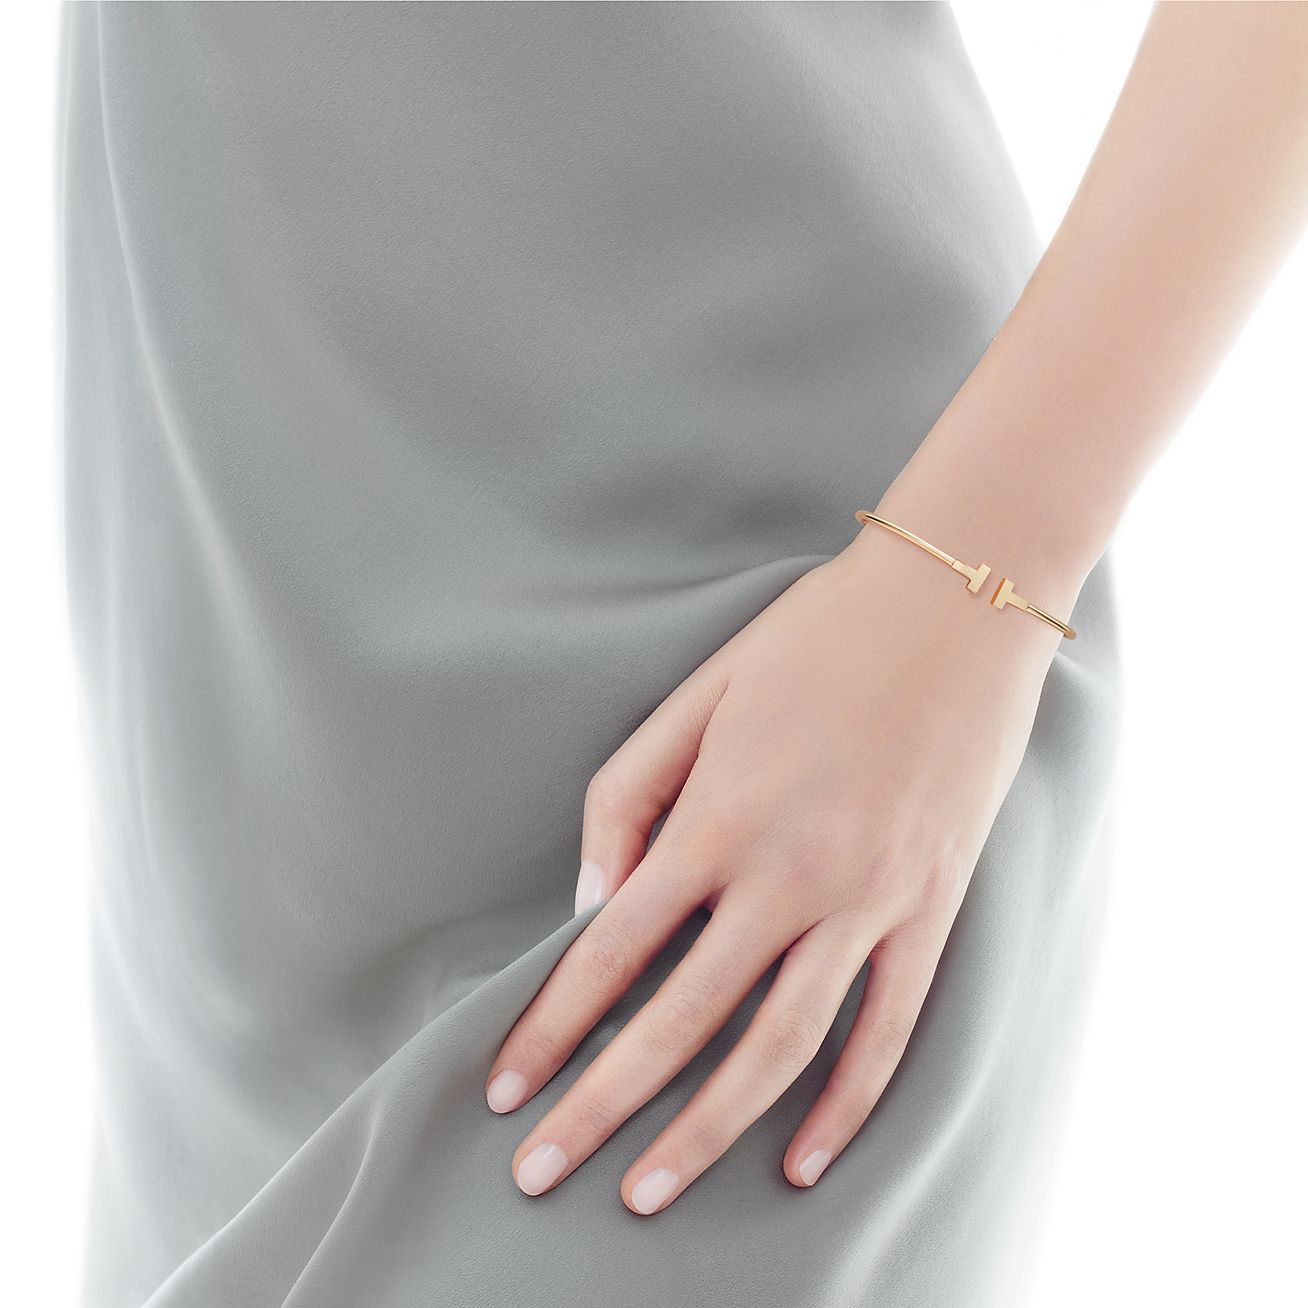 Tiffany T narrow wire bracelet in 18k gold, medium Tiffany & Co.